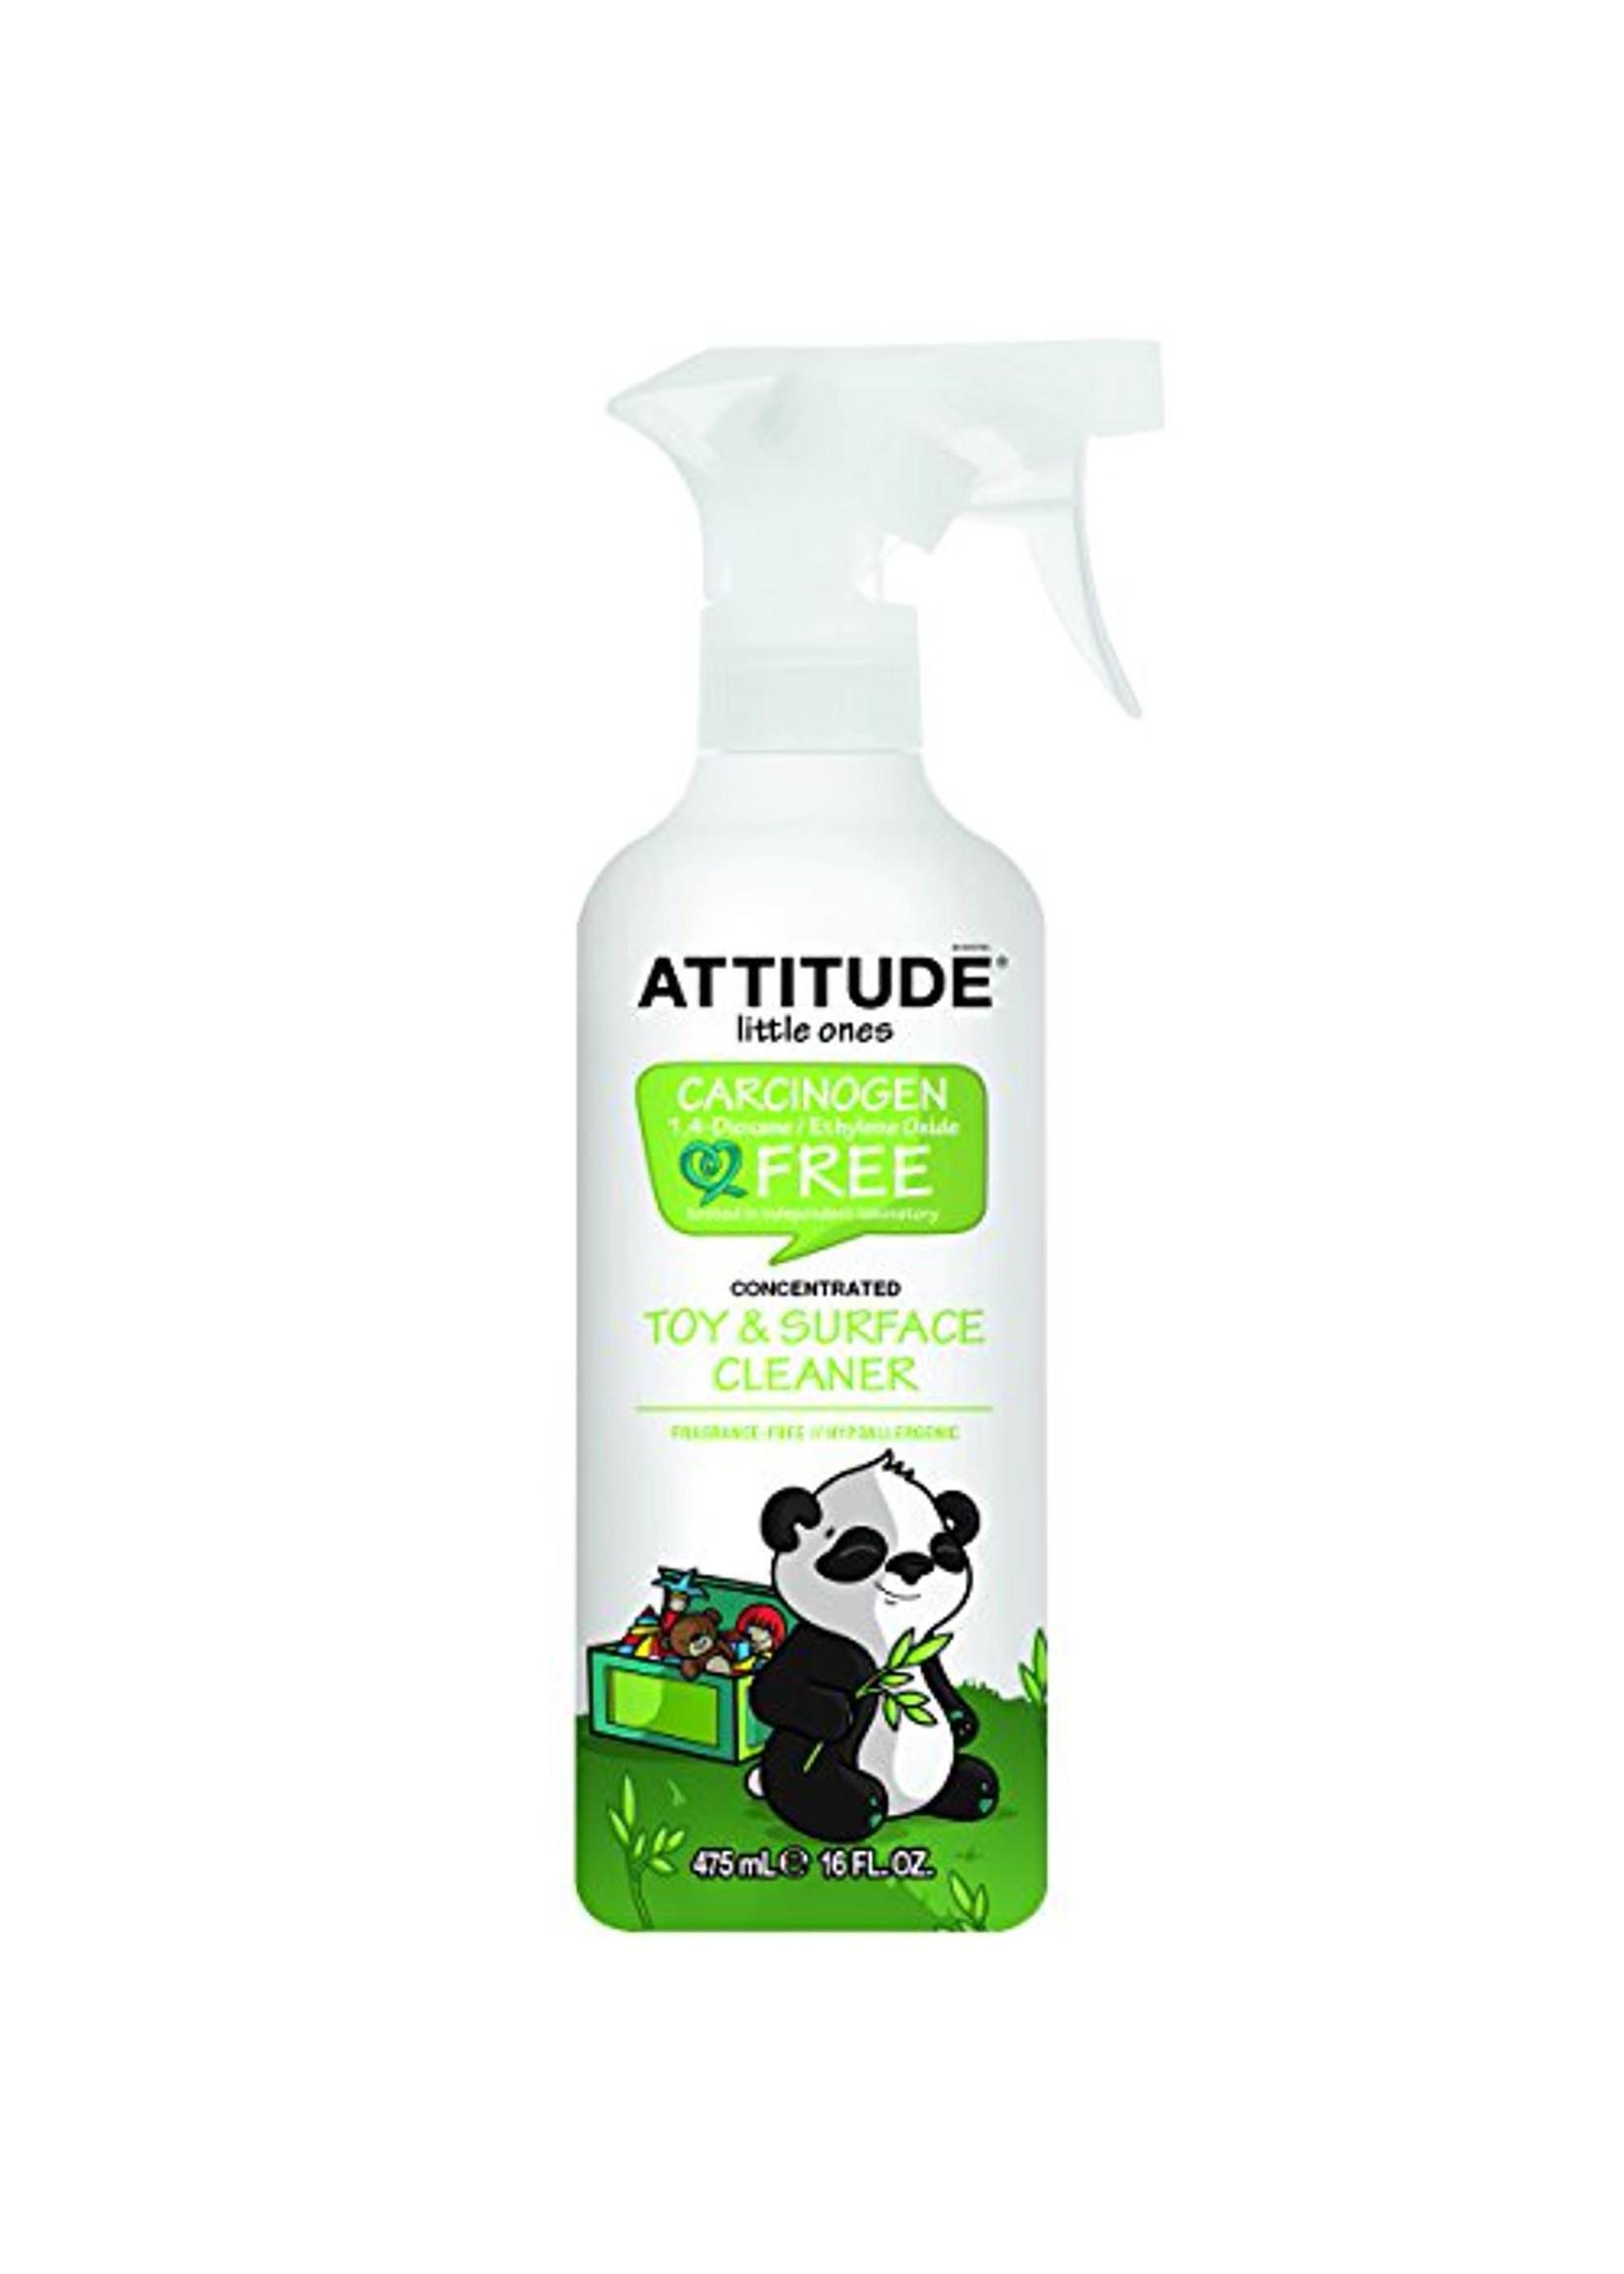 Attitude Attitude Toy & Surface Cleanser